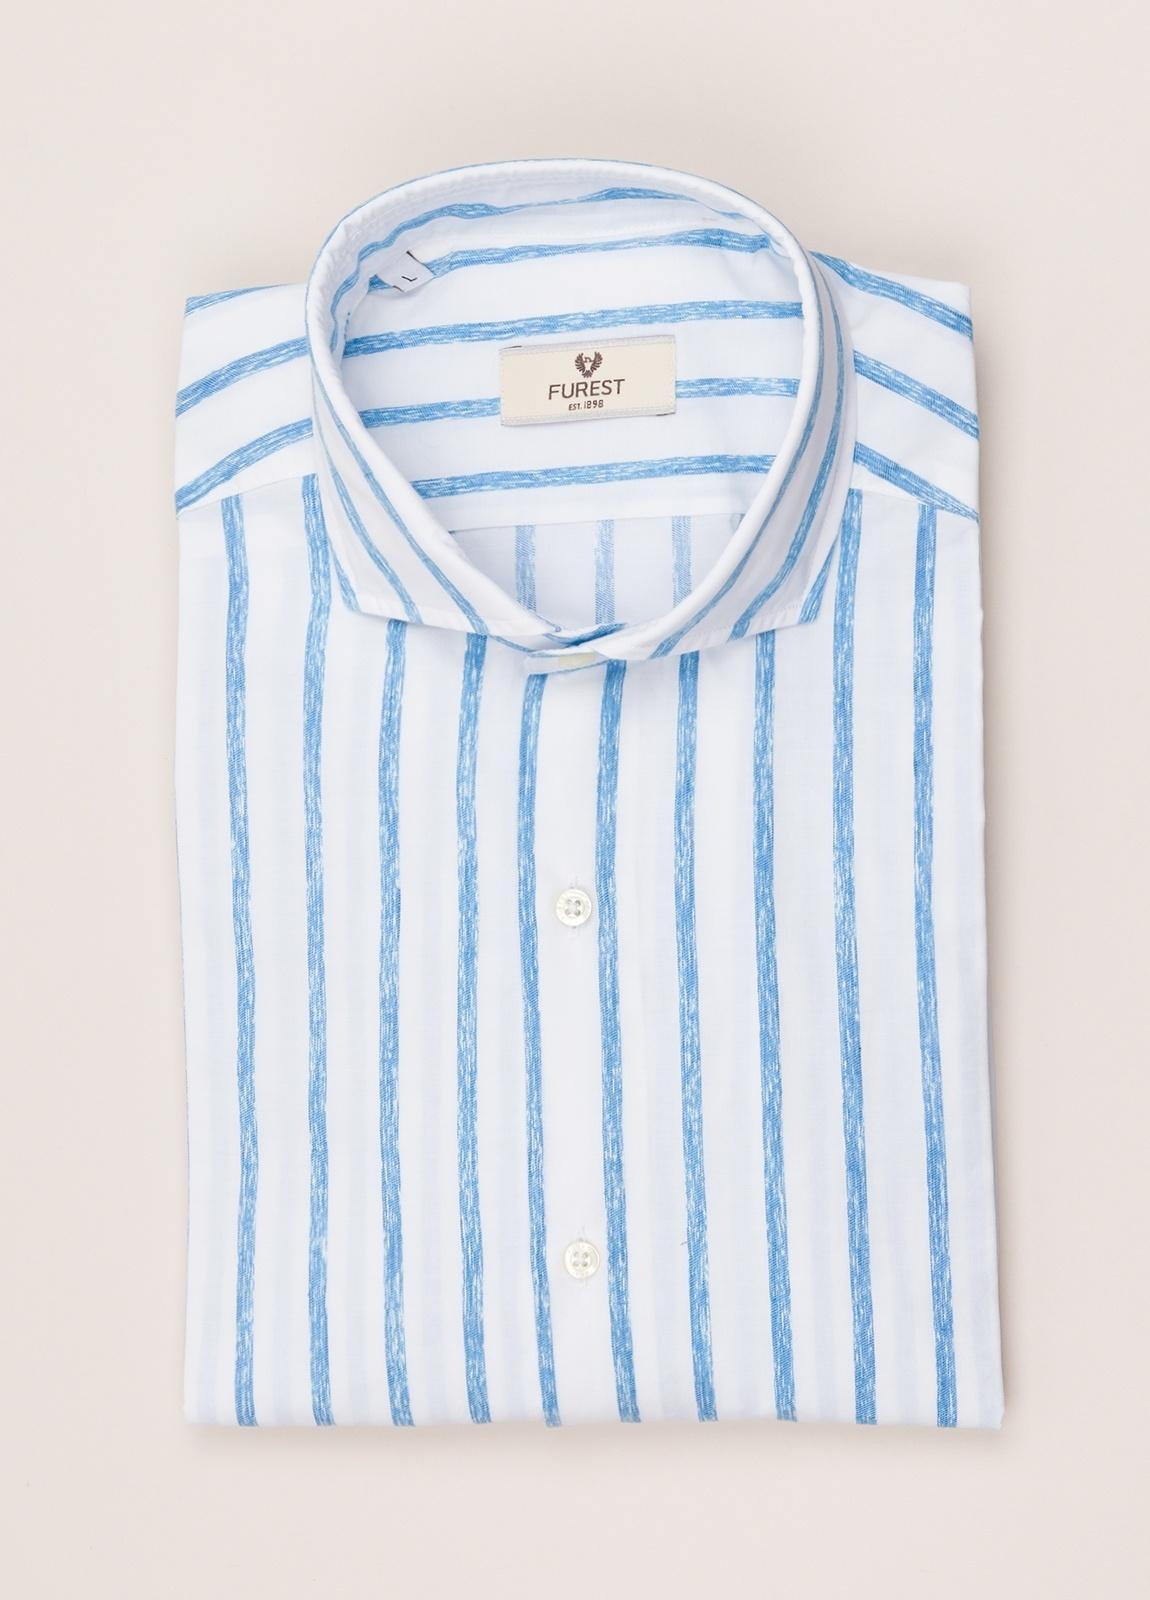 Camisa sport FUREST COLECCIÓN SLIM FIT rayas azul - Ítem3